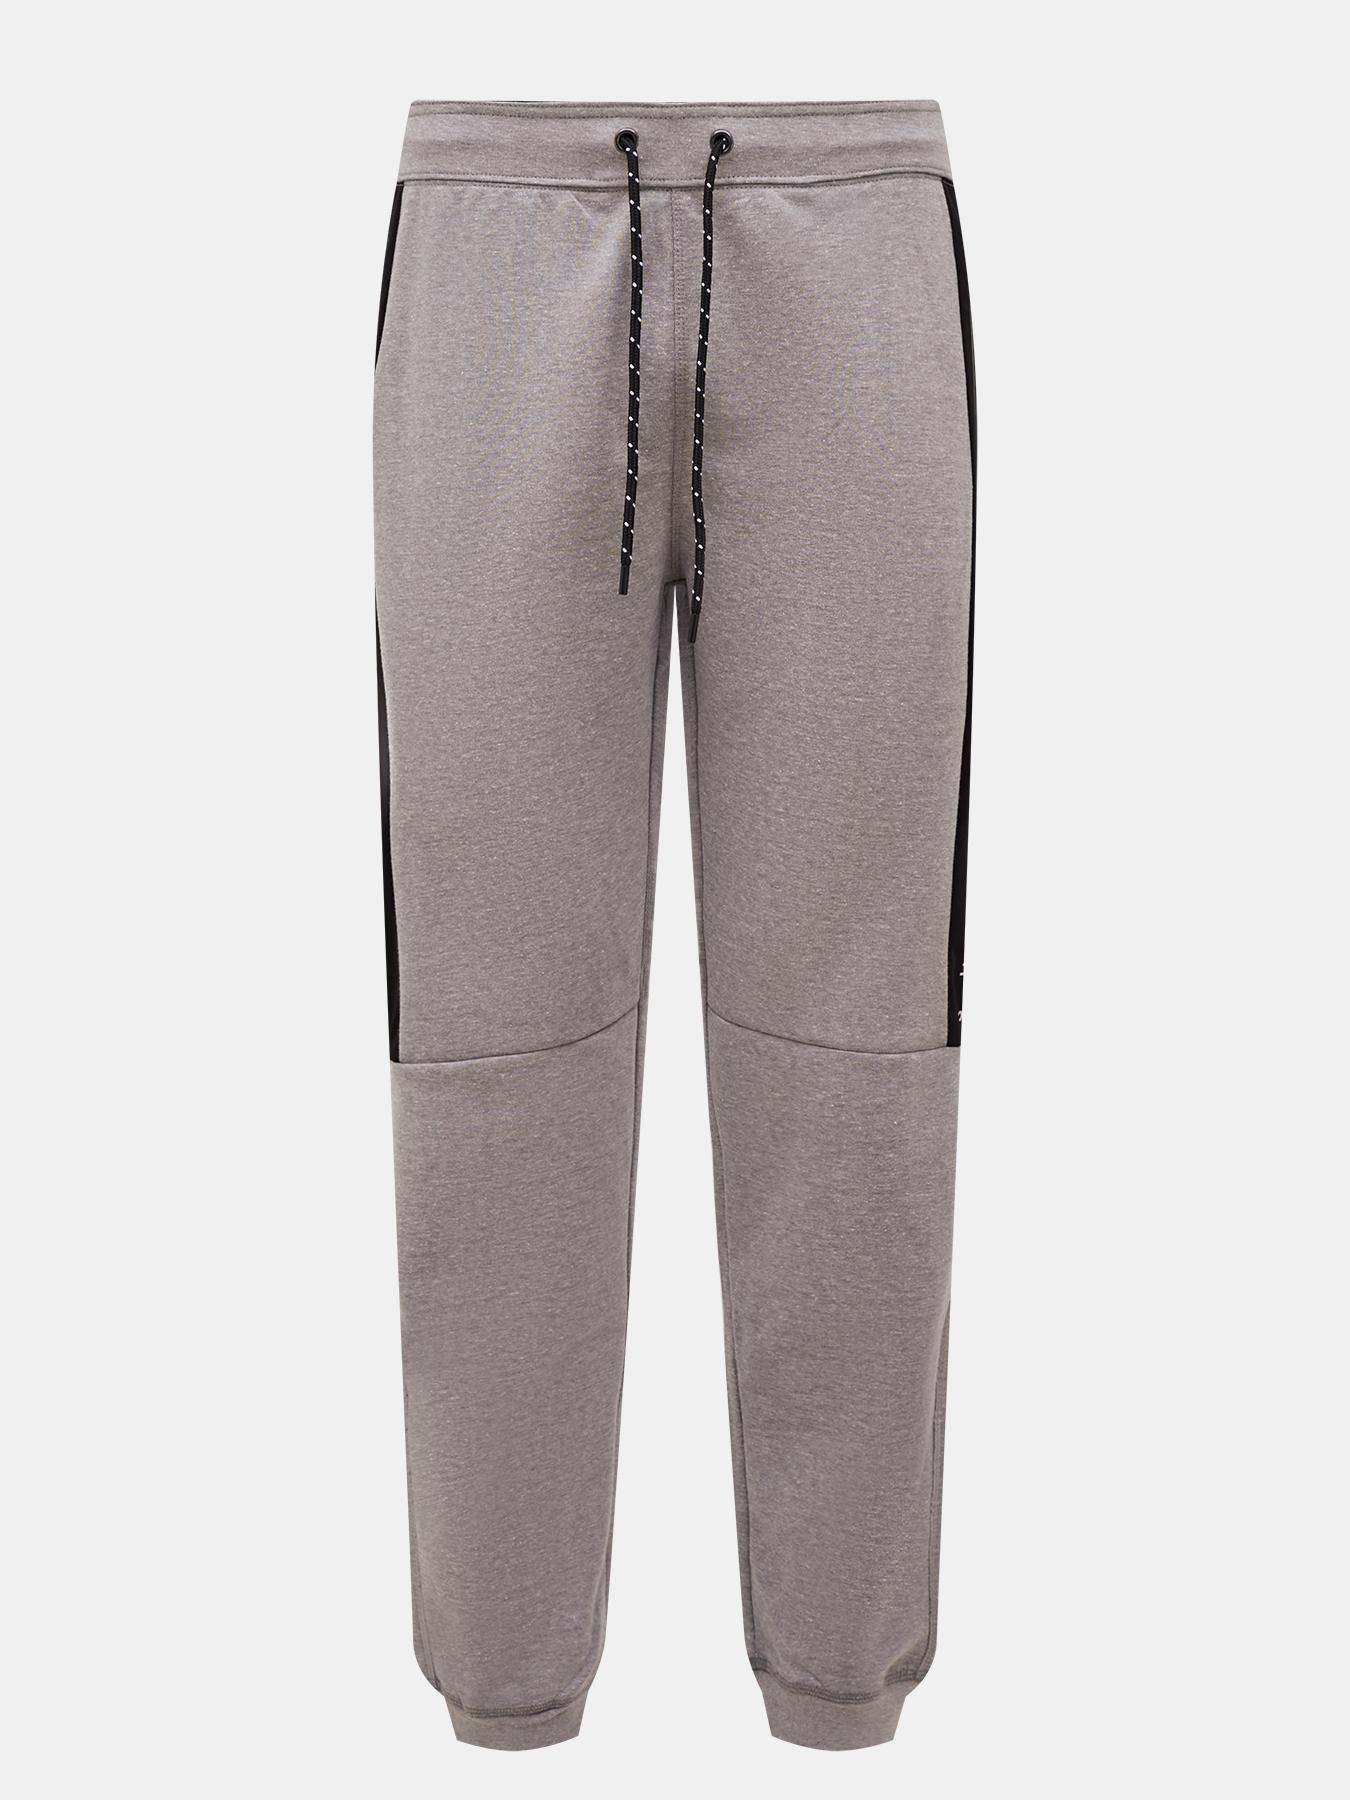 Спортивные брюки Ritter Jeans Брюки